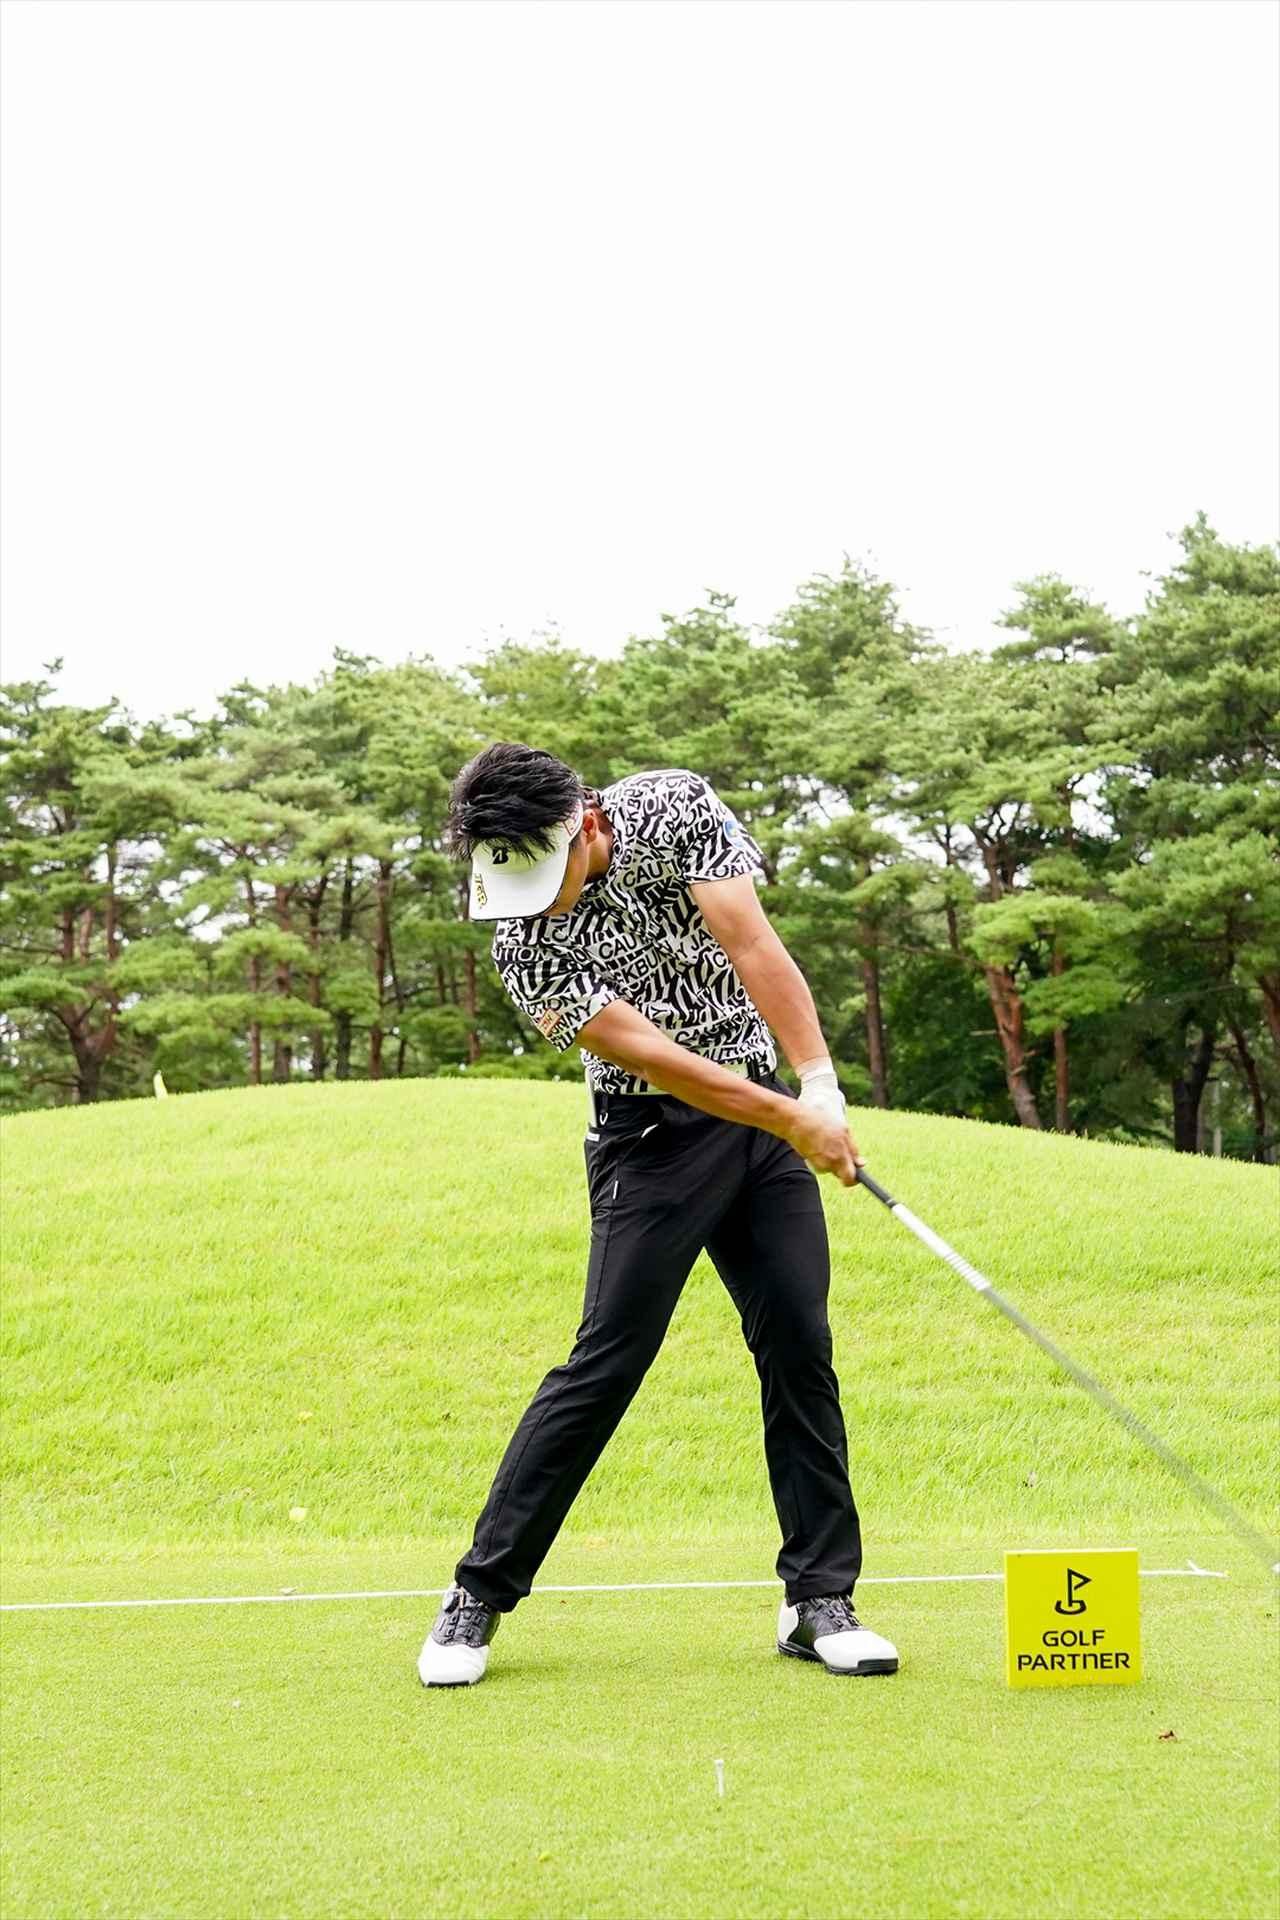 Images : 8番目の画像 - 関藤直煕 ドライバー正面連続写真 - みんなのゴルフダイジェスト